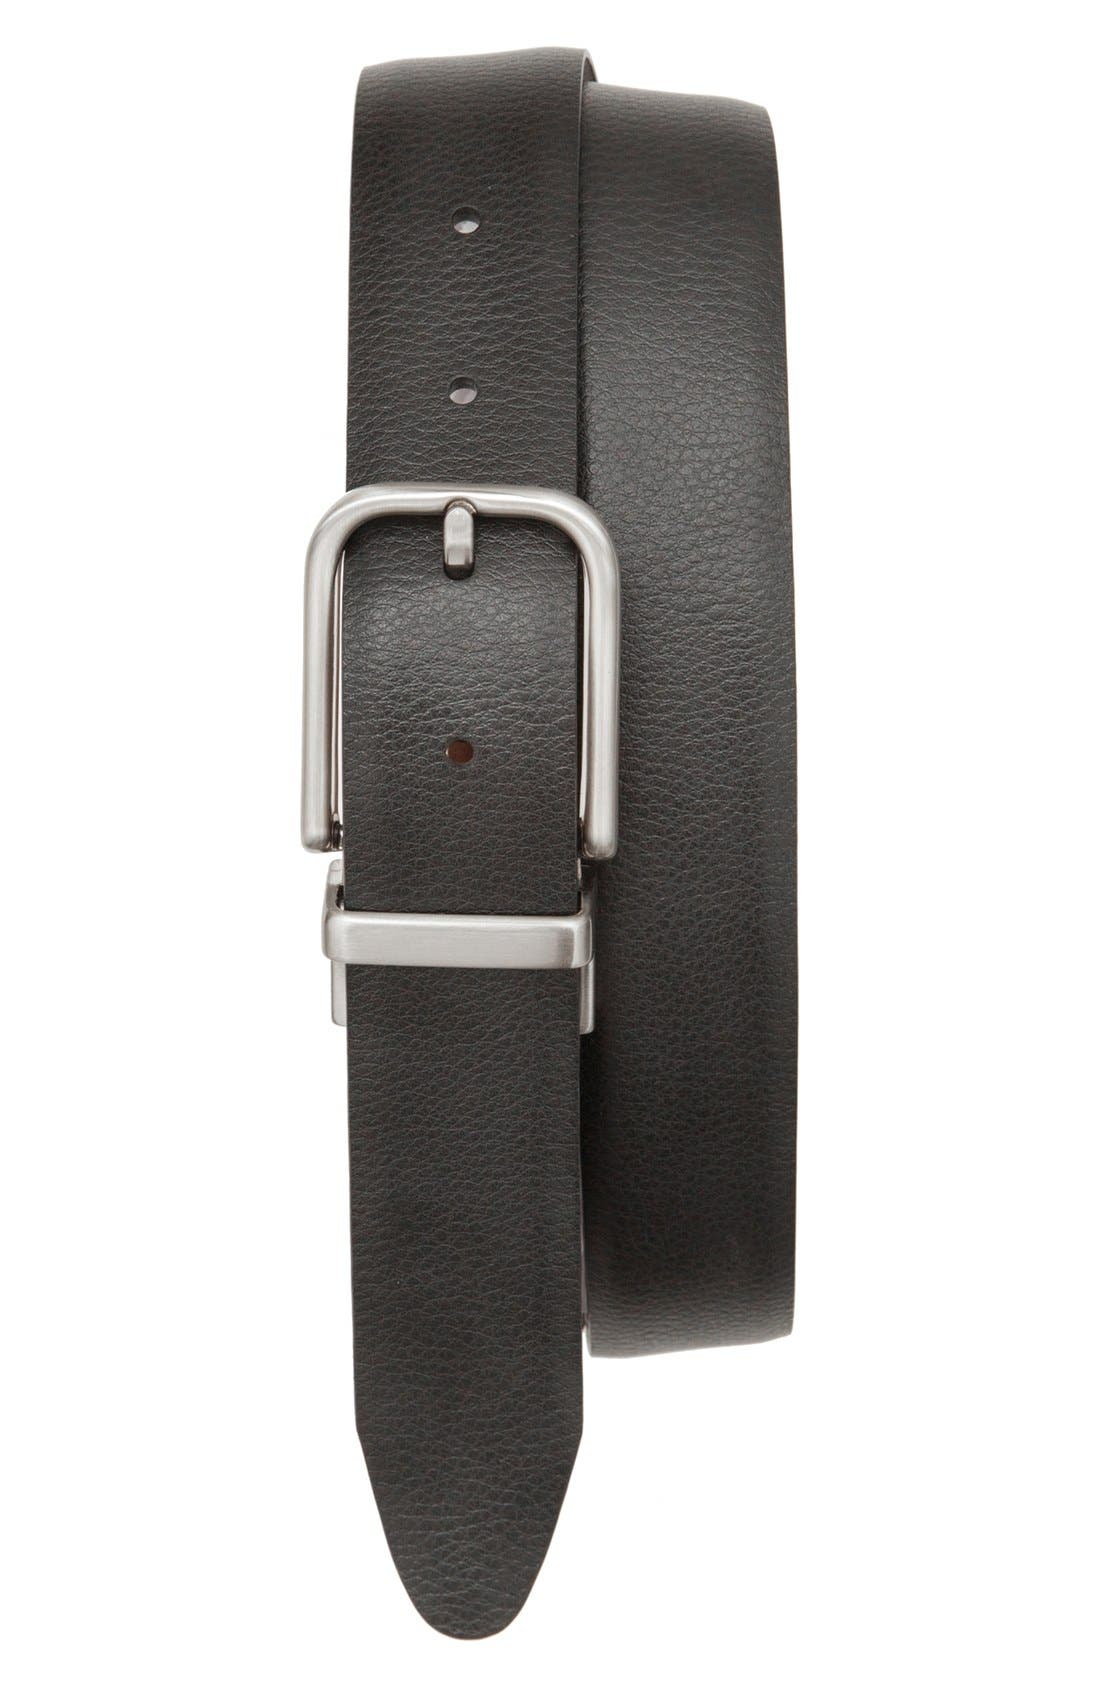 Reversible Leather Belt,                             Main thumbnail 1, color,                             Tan/ Black